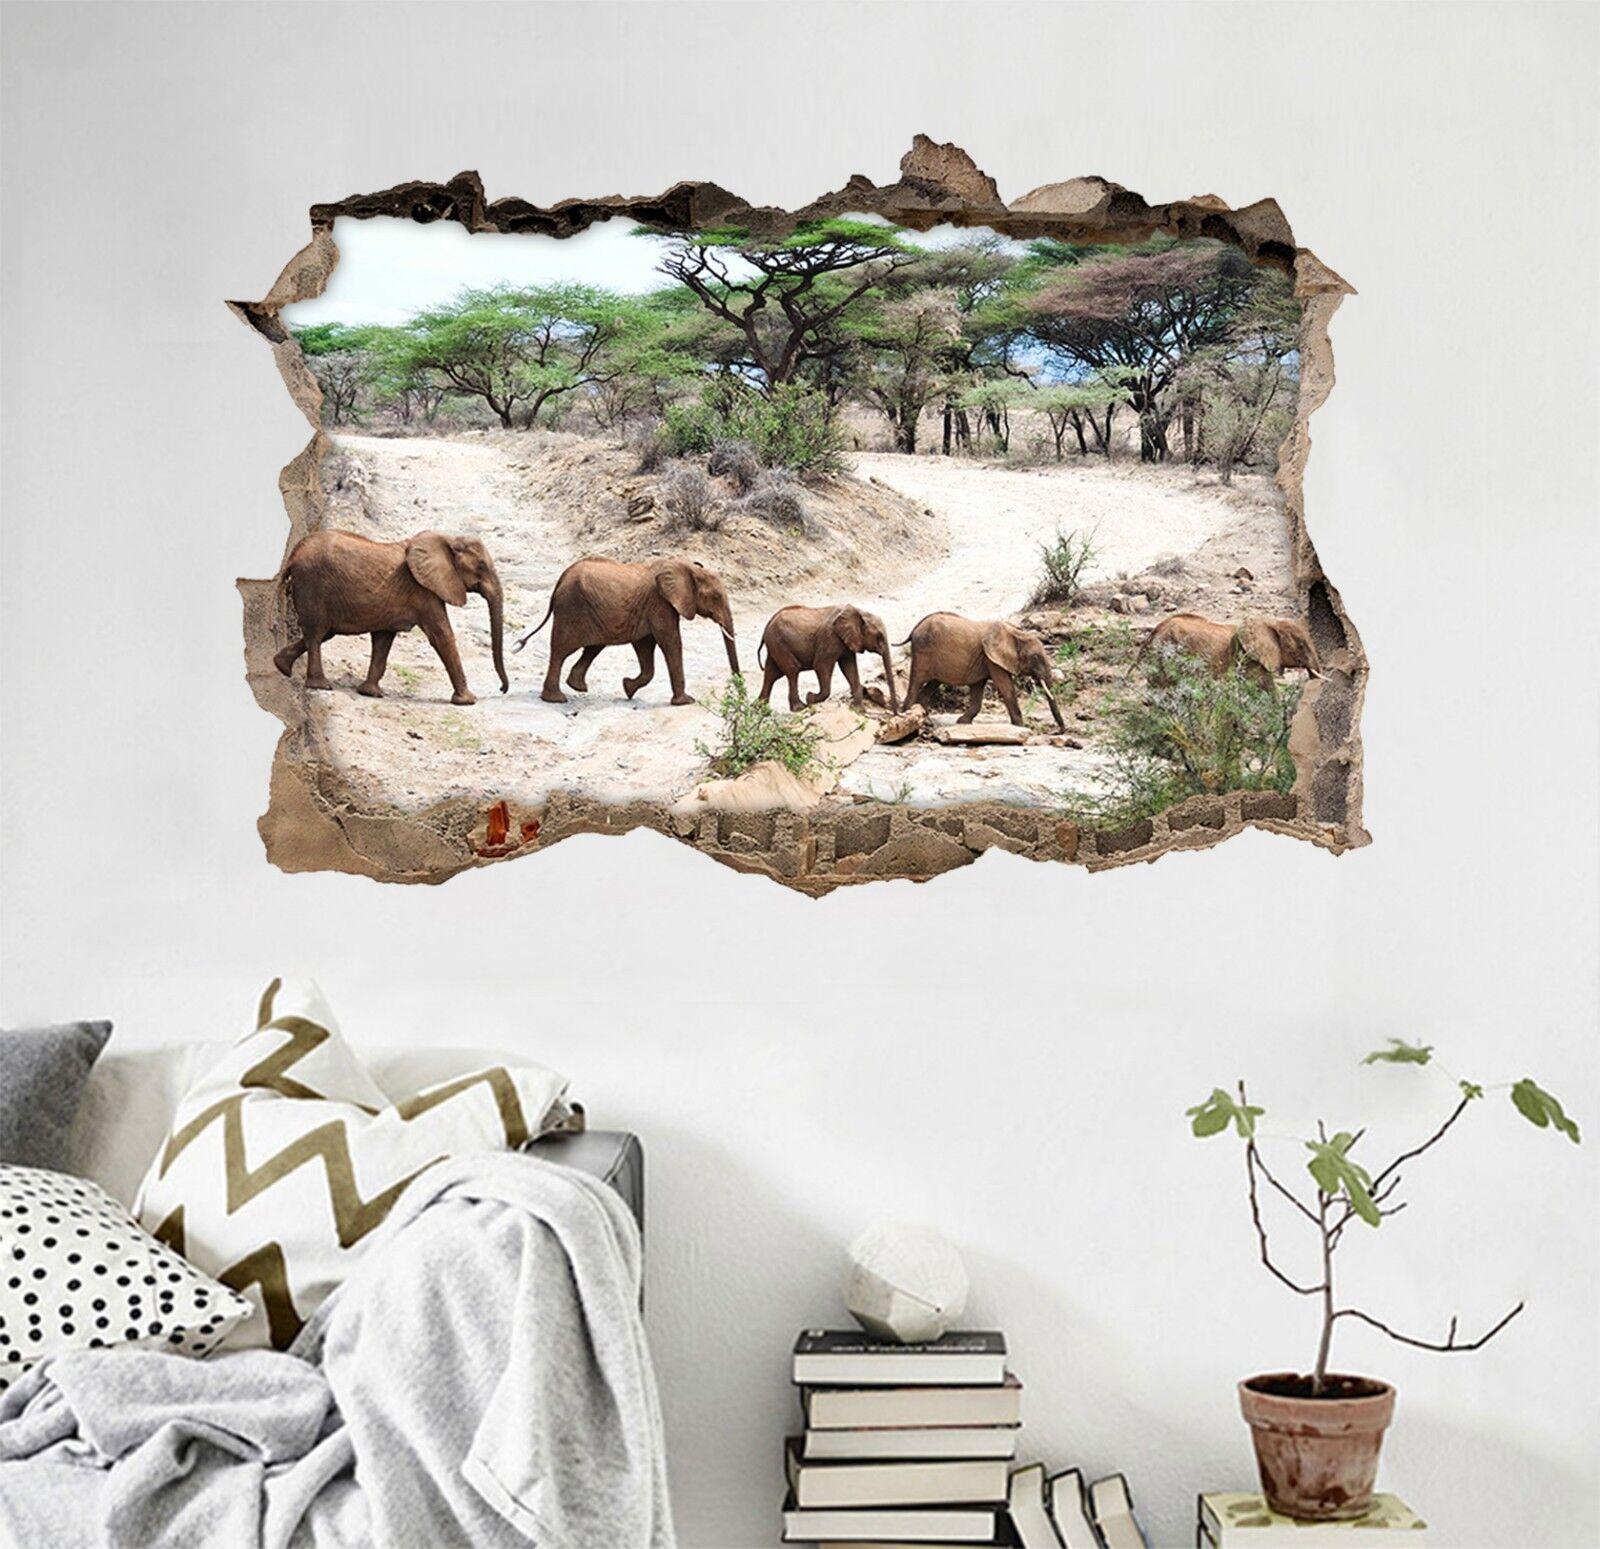 3D Trekking Elefanti 16 Parete Murales Adesivi Decal Sfondamento AJ WALLPAPER IT